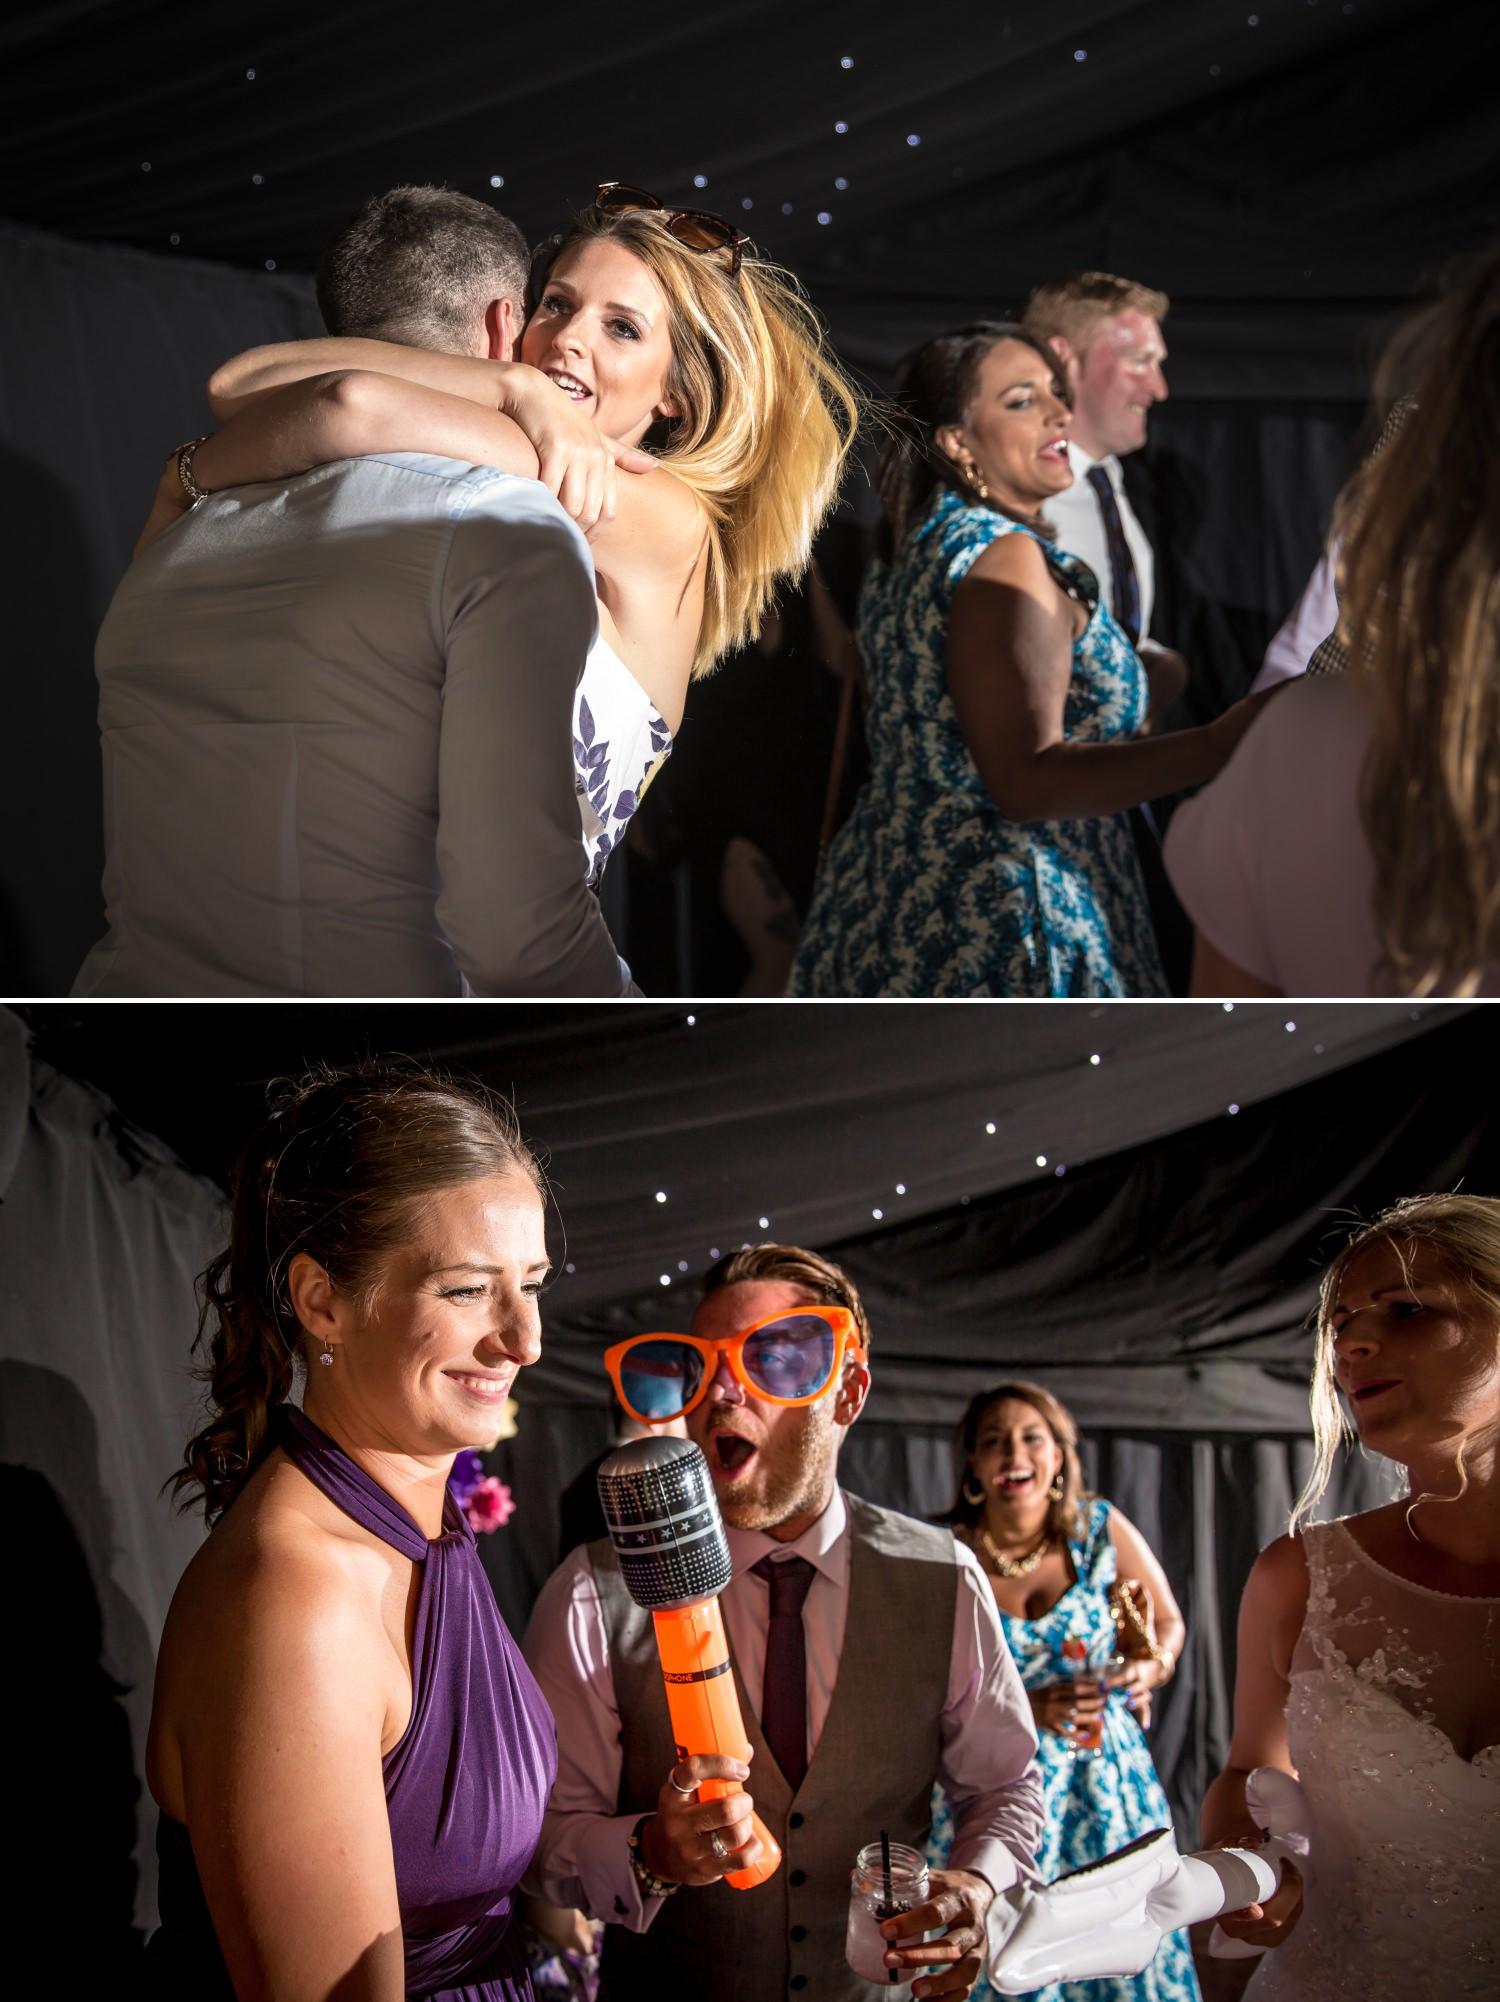 Wedding photographs of evening dancing at Pentrehobyn Hall